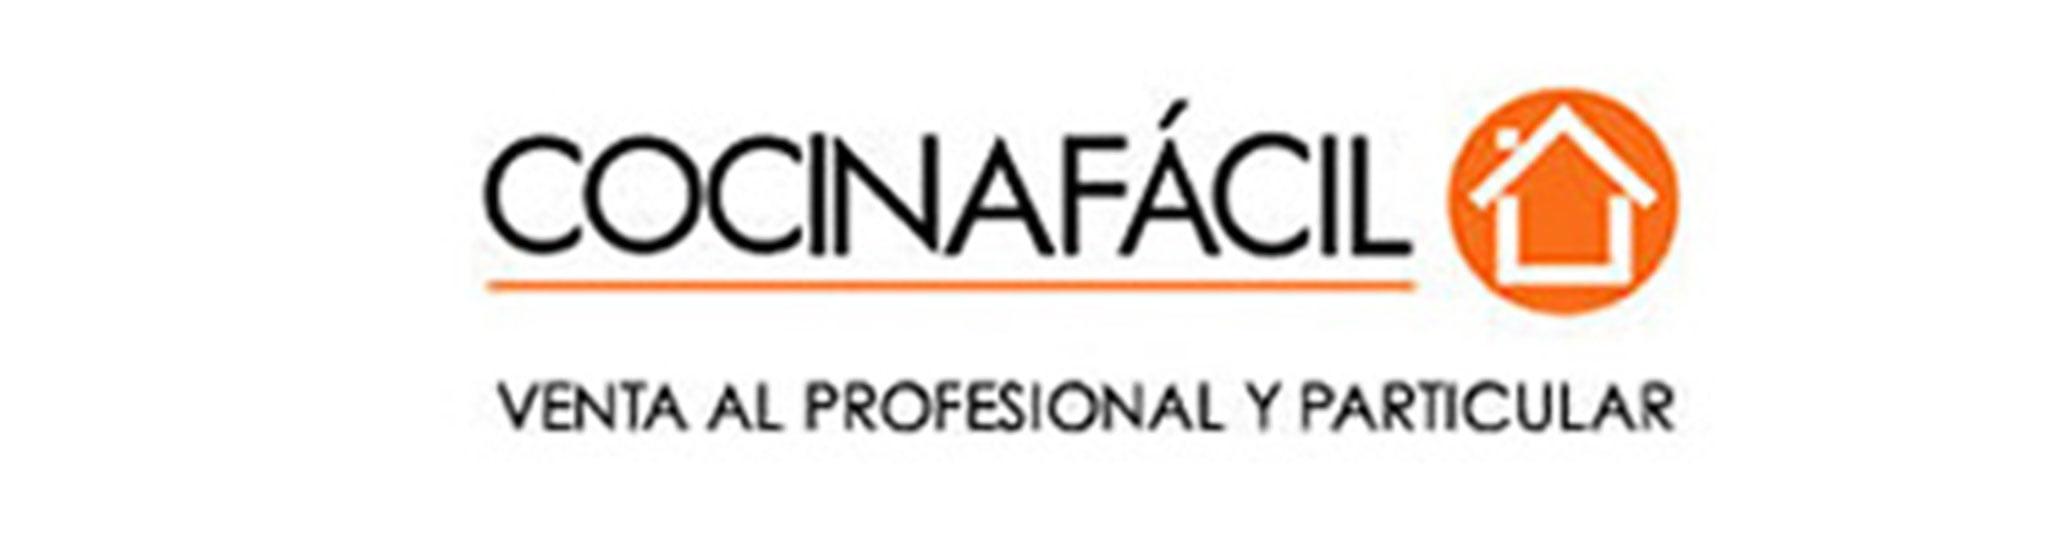 Logotipo de Cocina Fácil